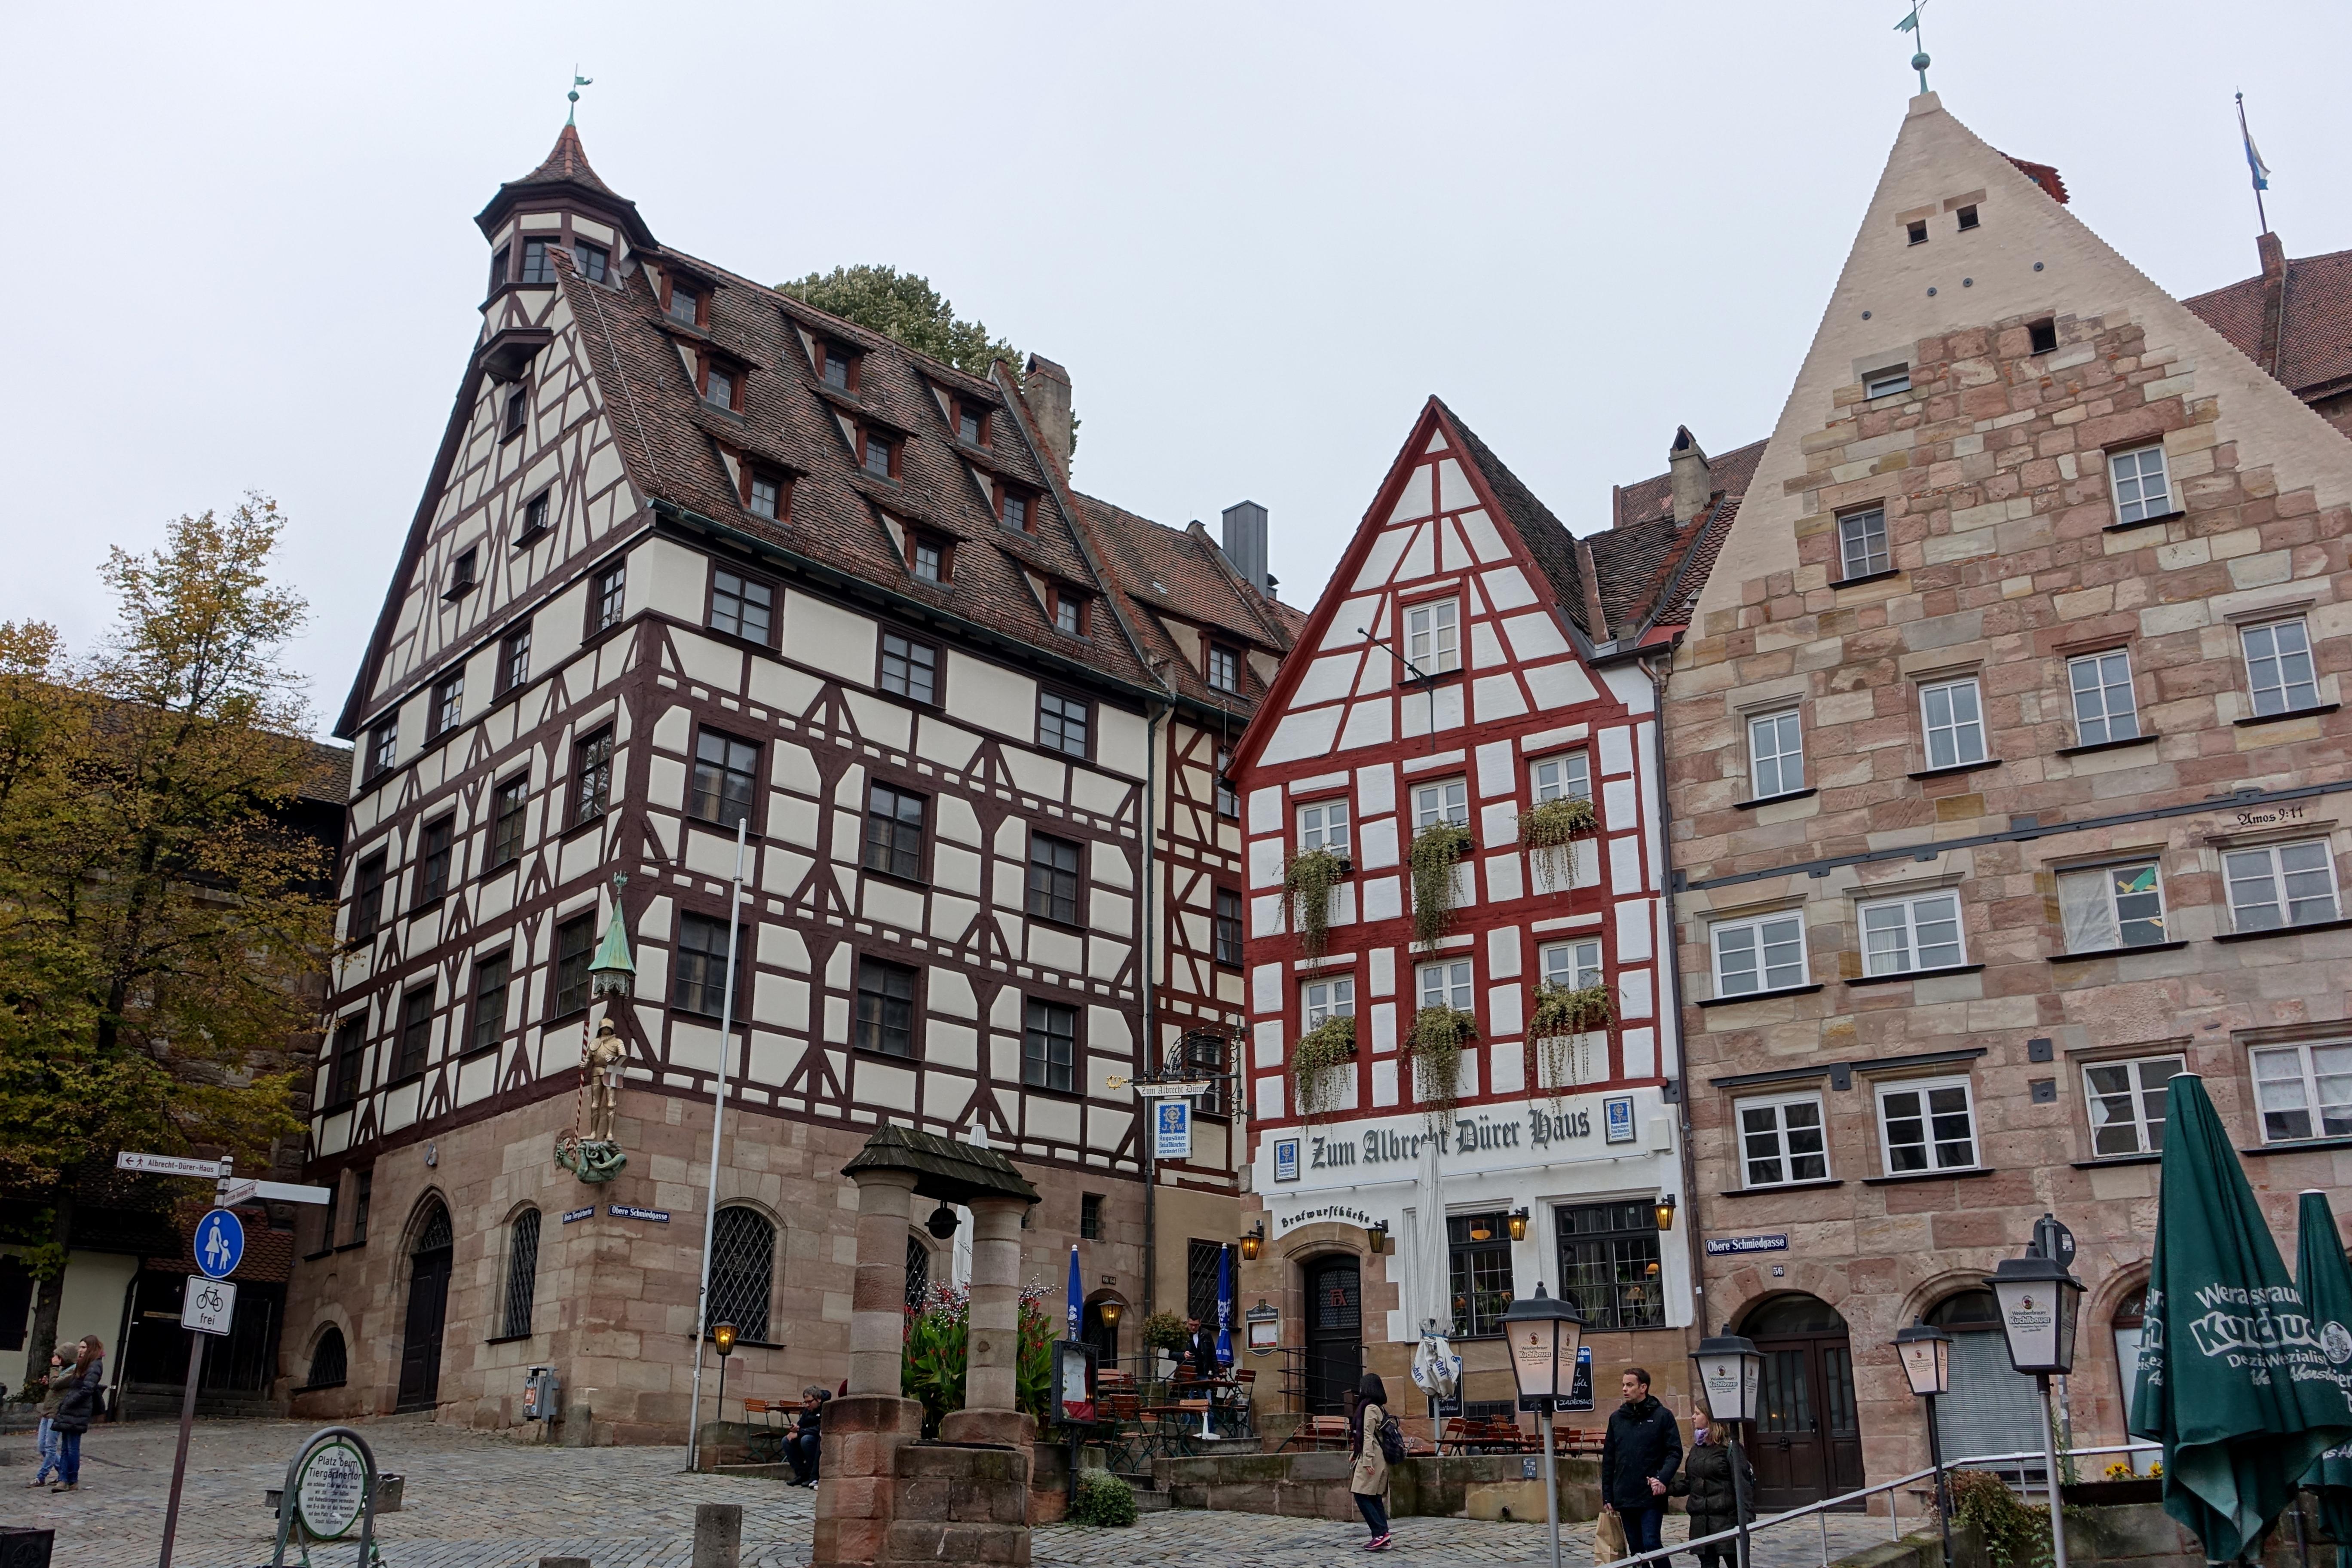 Tierg%C3%A4rtnerplatz_-_Nuremberg%2C_Germany_-_DSC02019.jpg